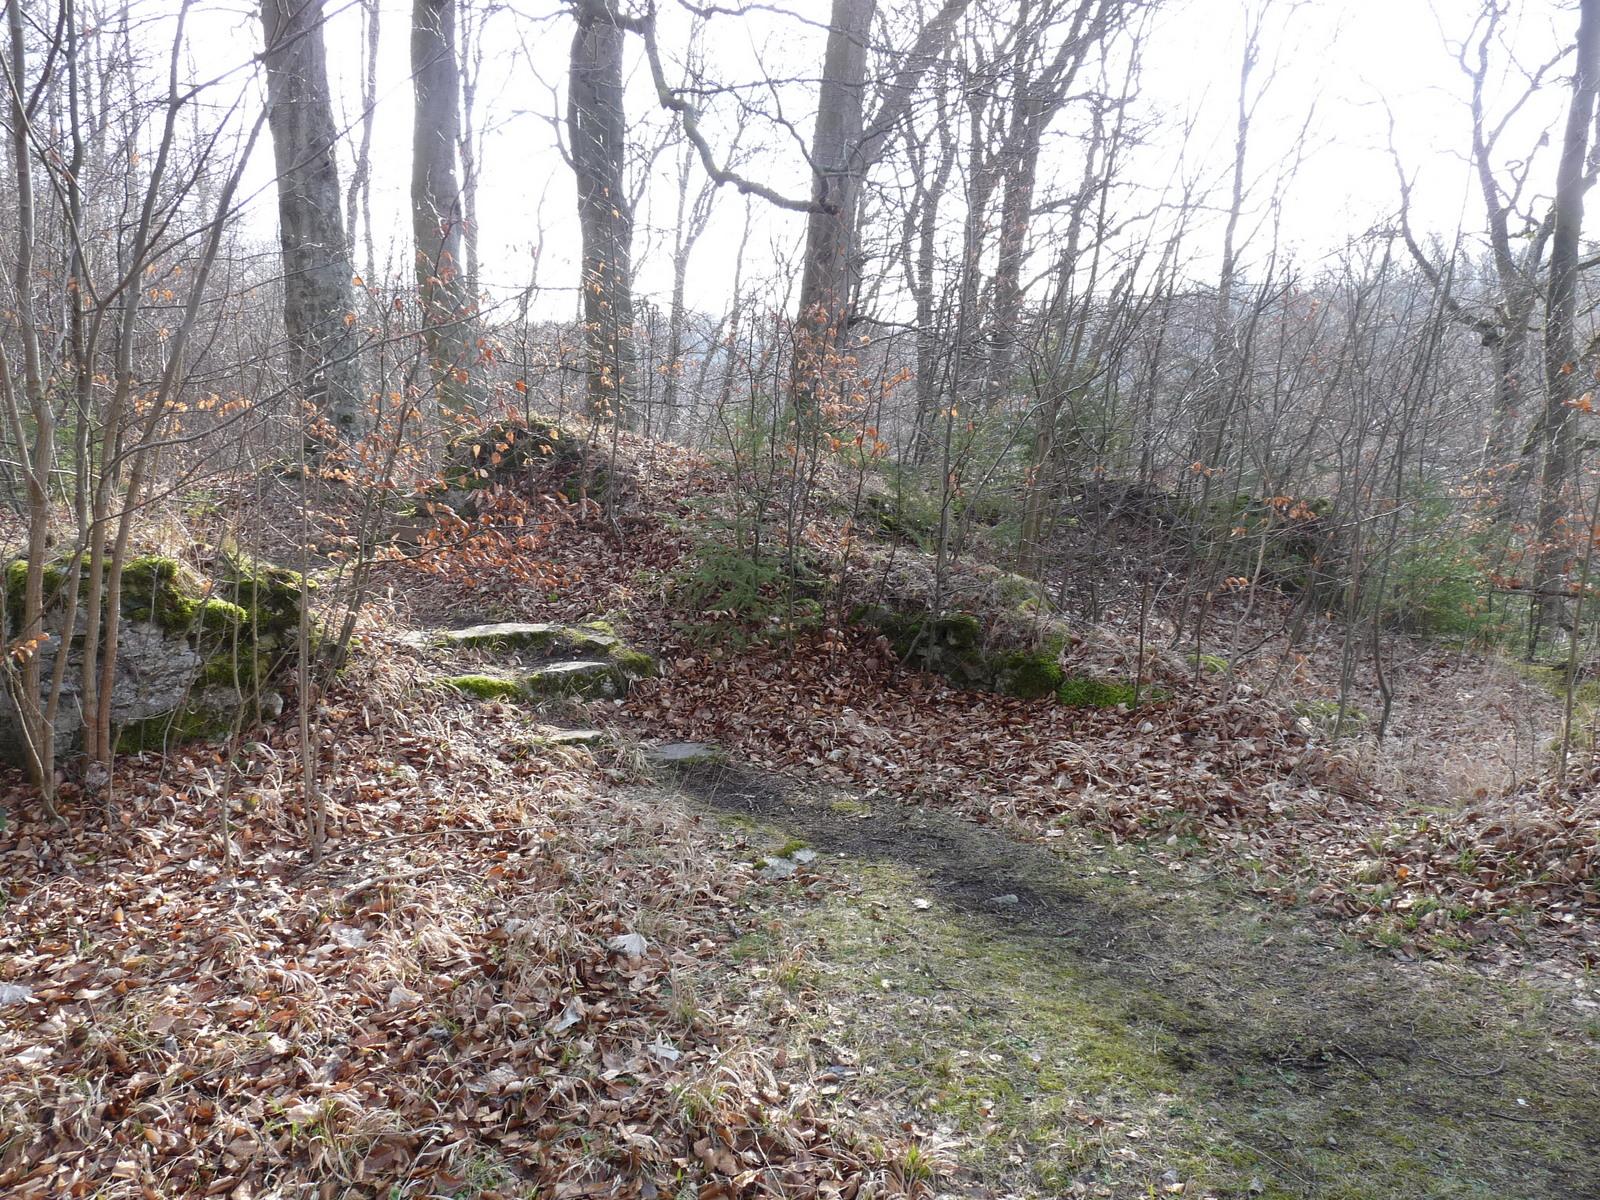 Mauerreste über der Höhle des Klosters